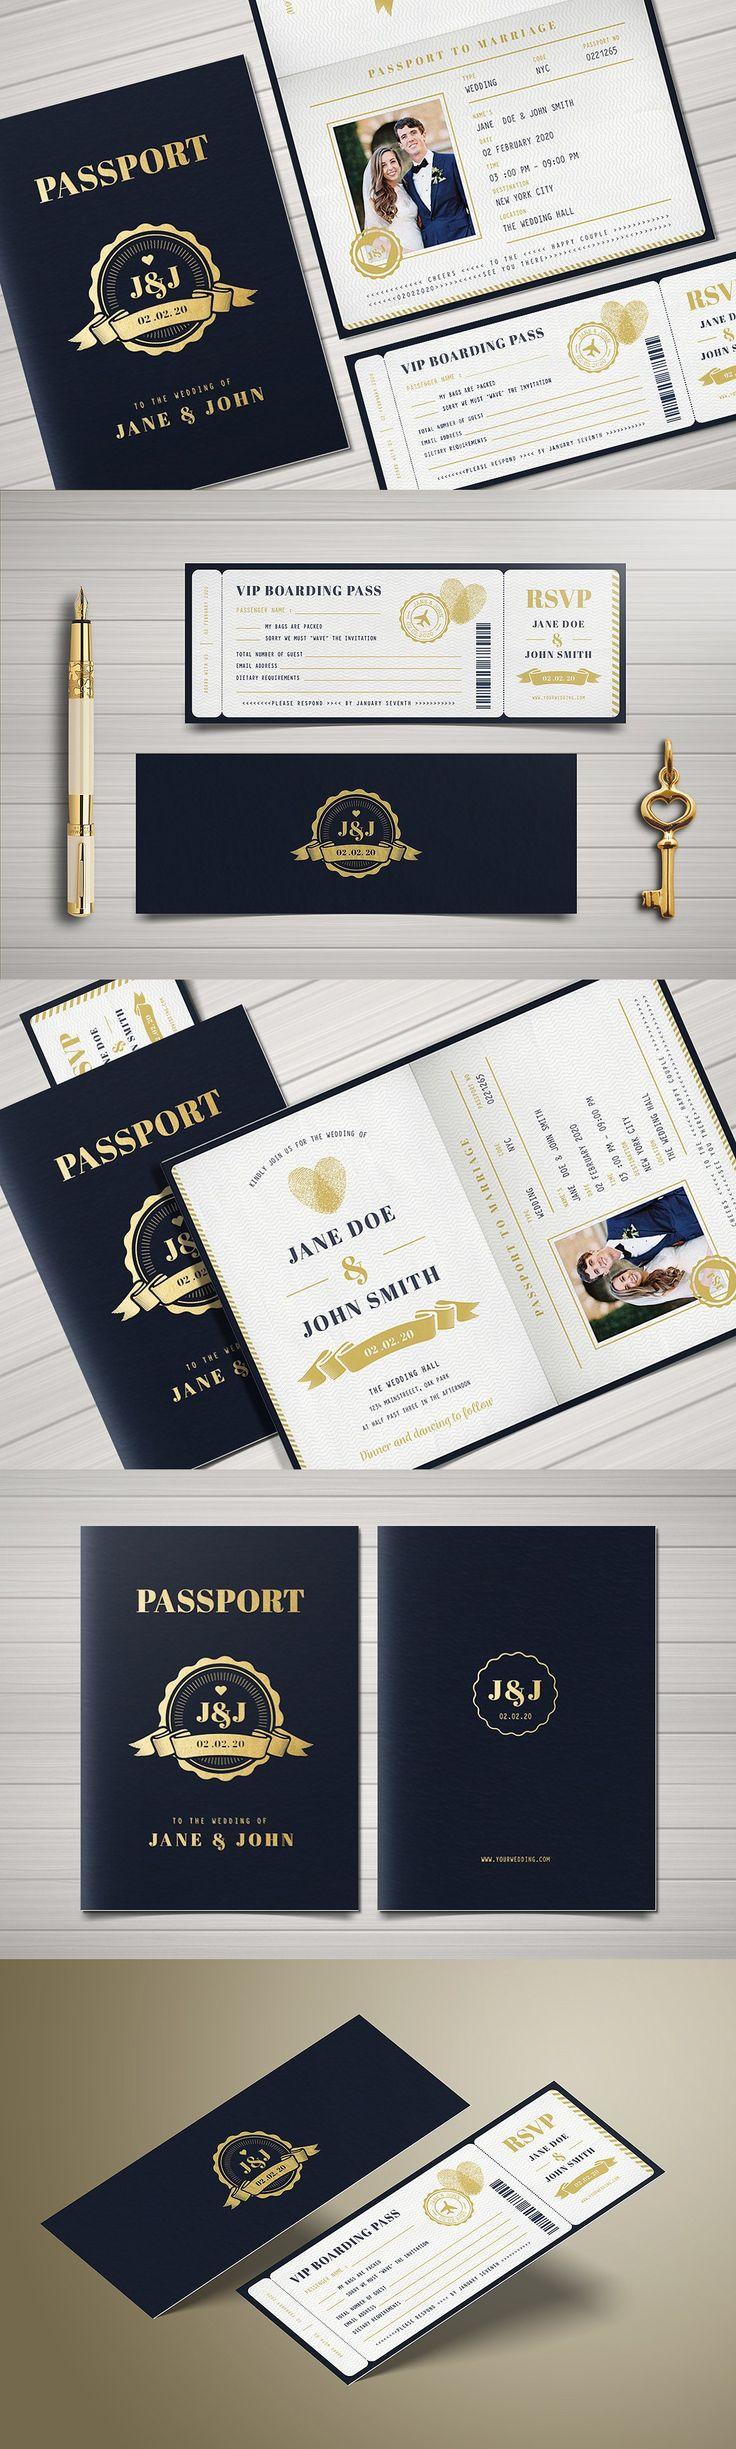 Passport Wedding Invitation Templates PSD, AI